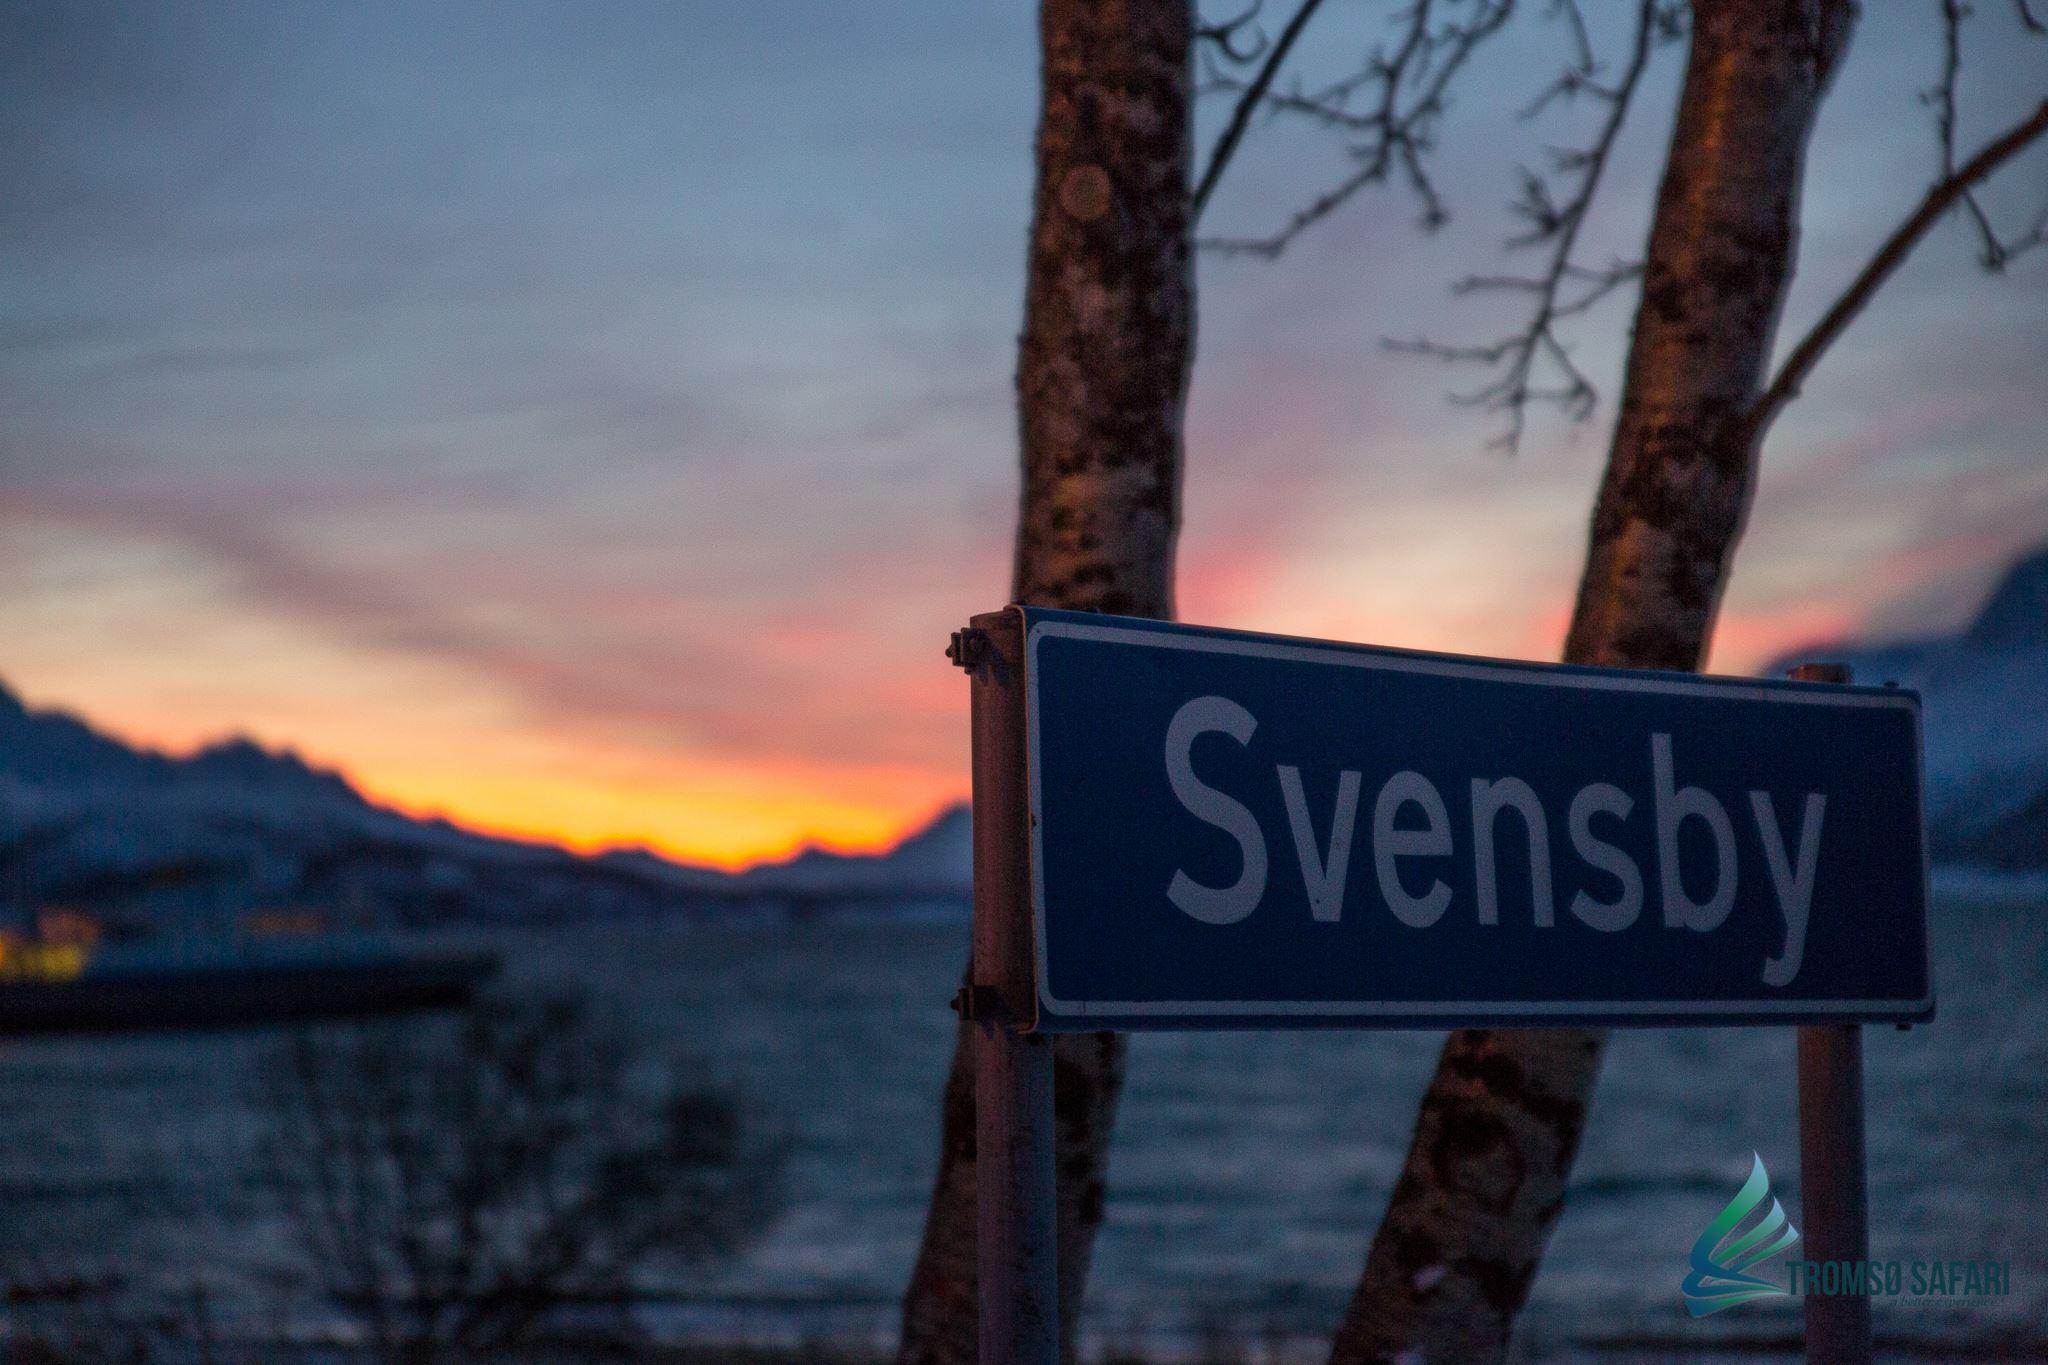 Svensby Tursenter Cabins